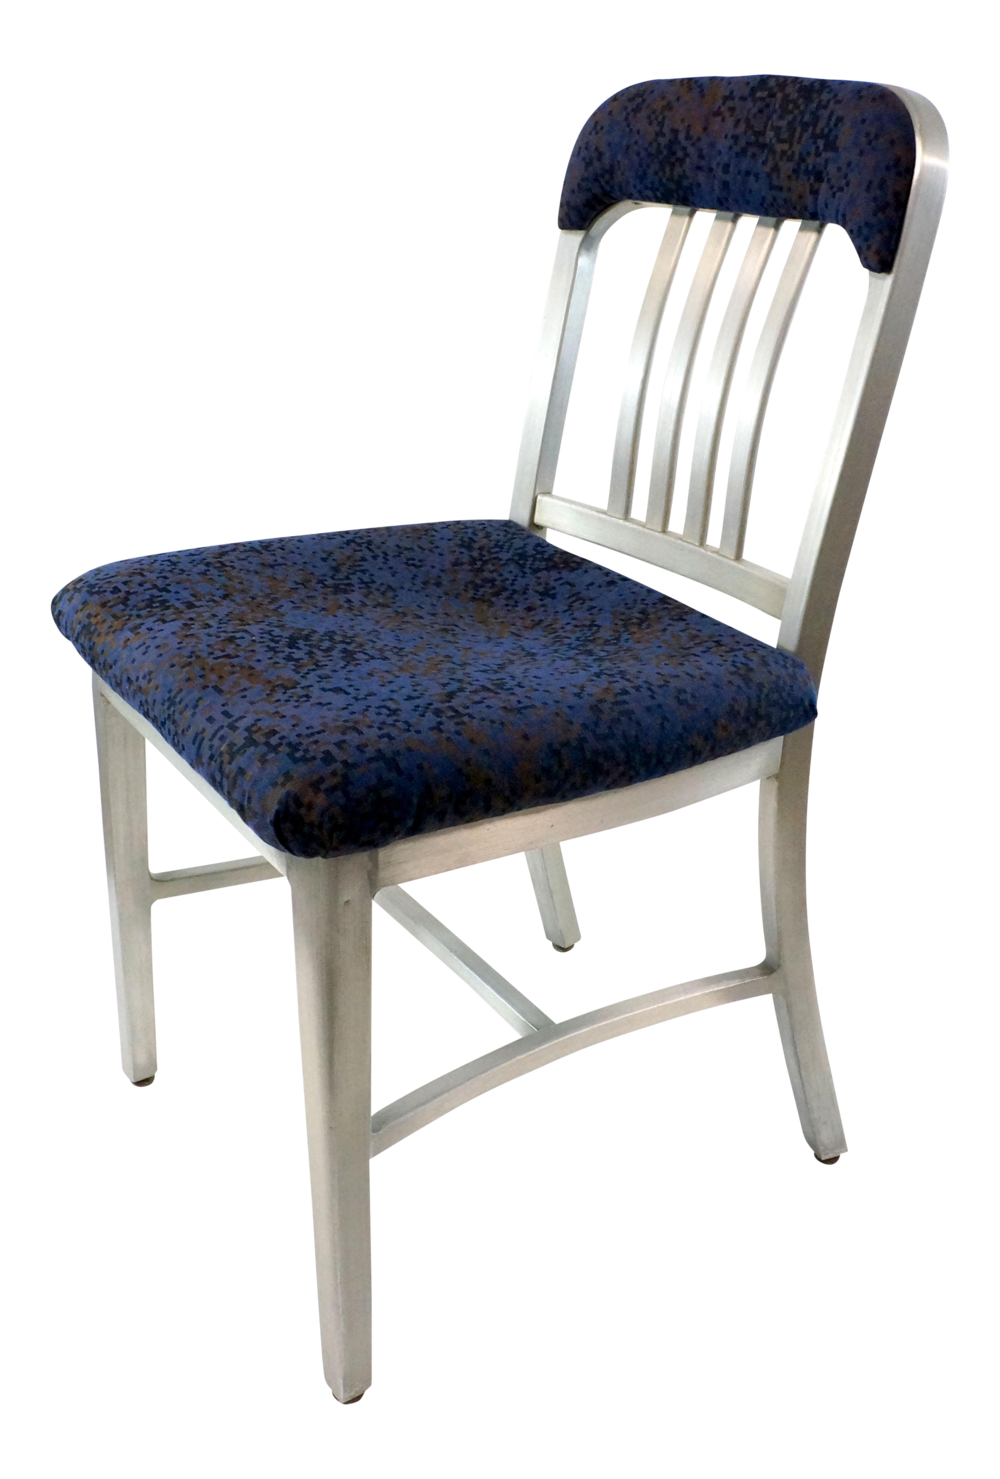 goodform-aluminum-navy-chair-6631.png